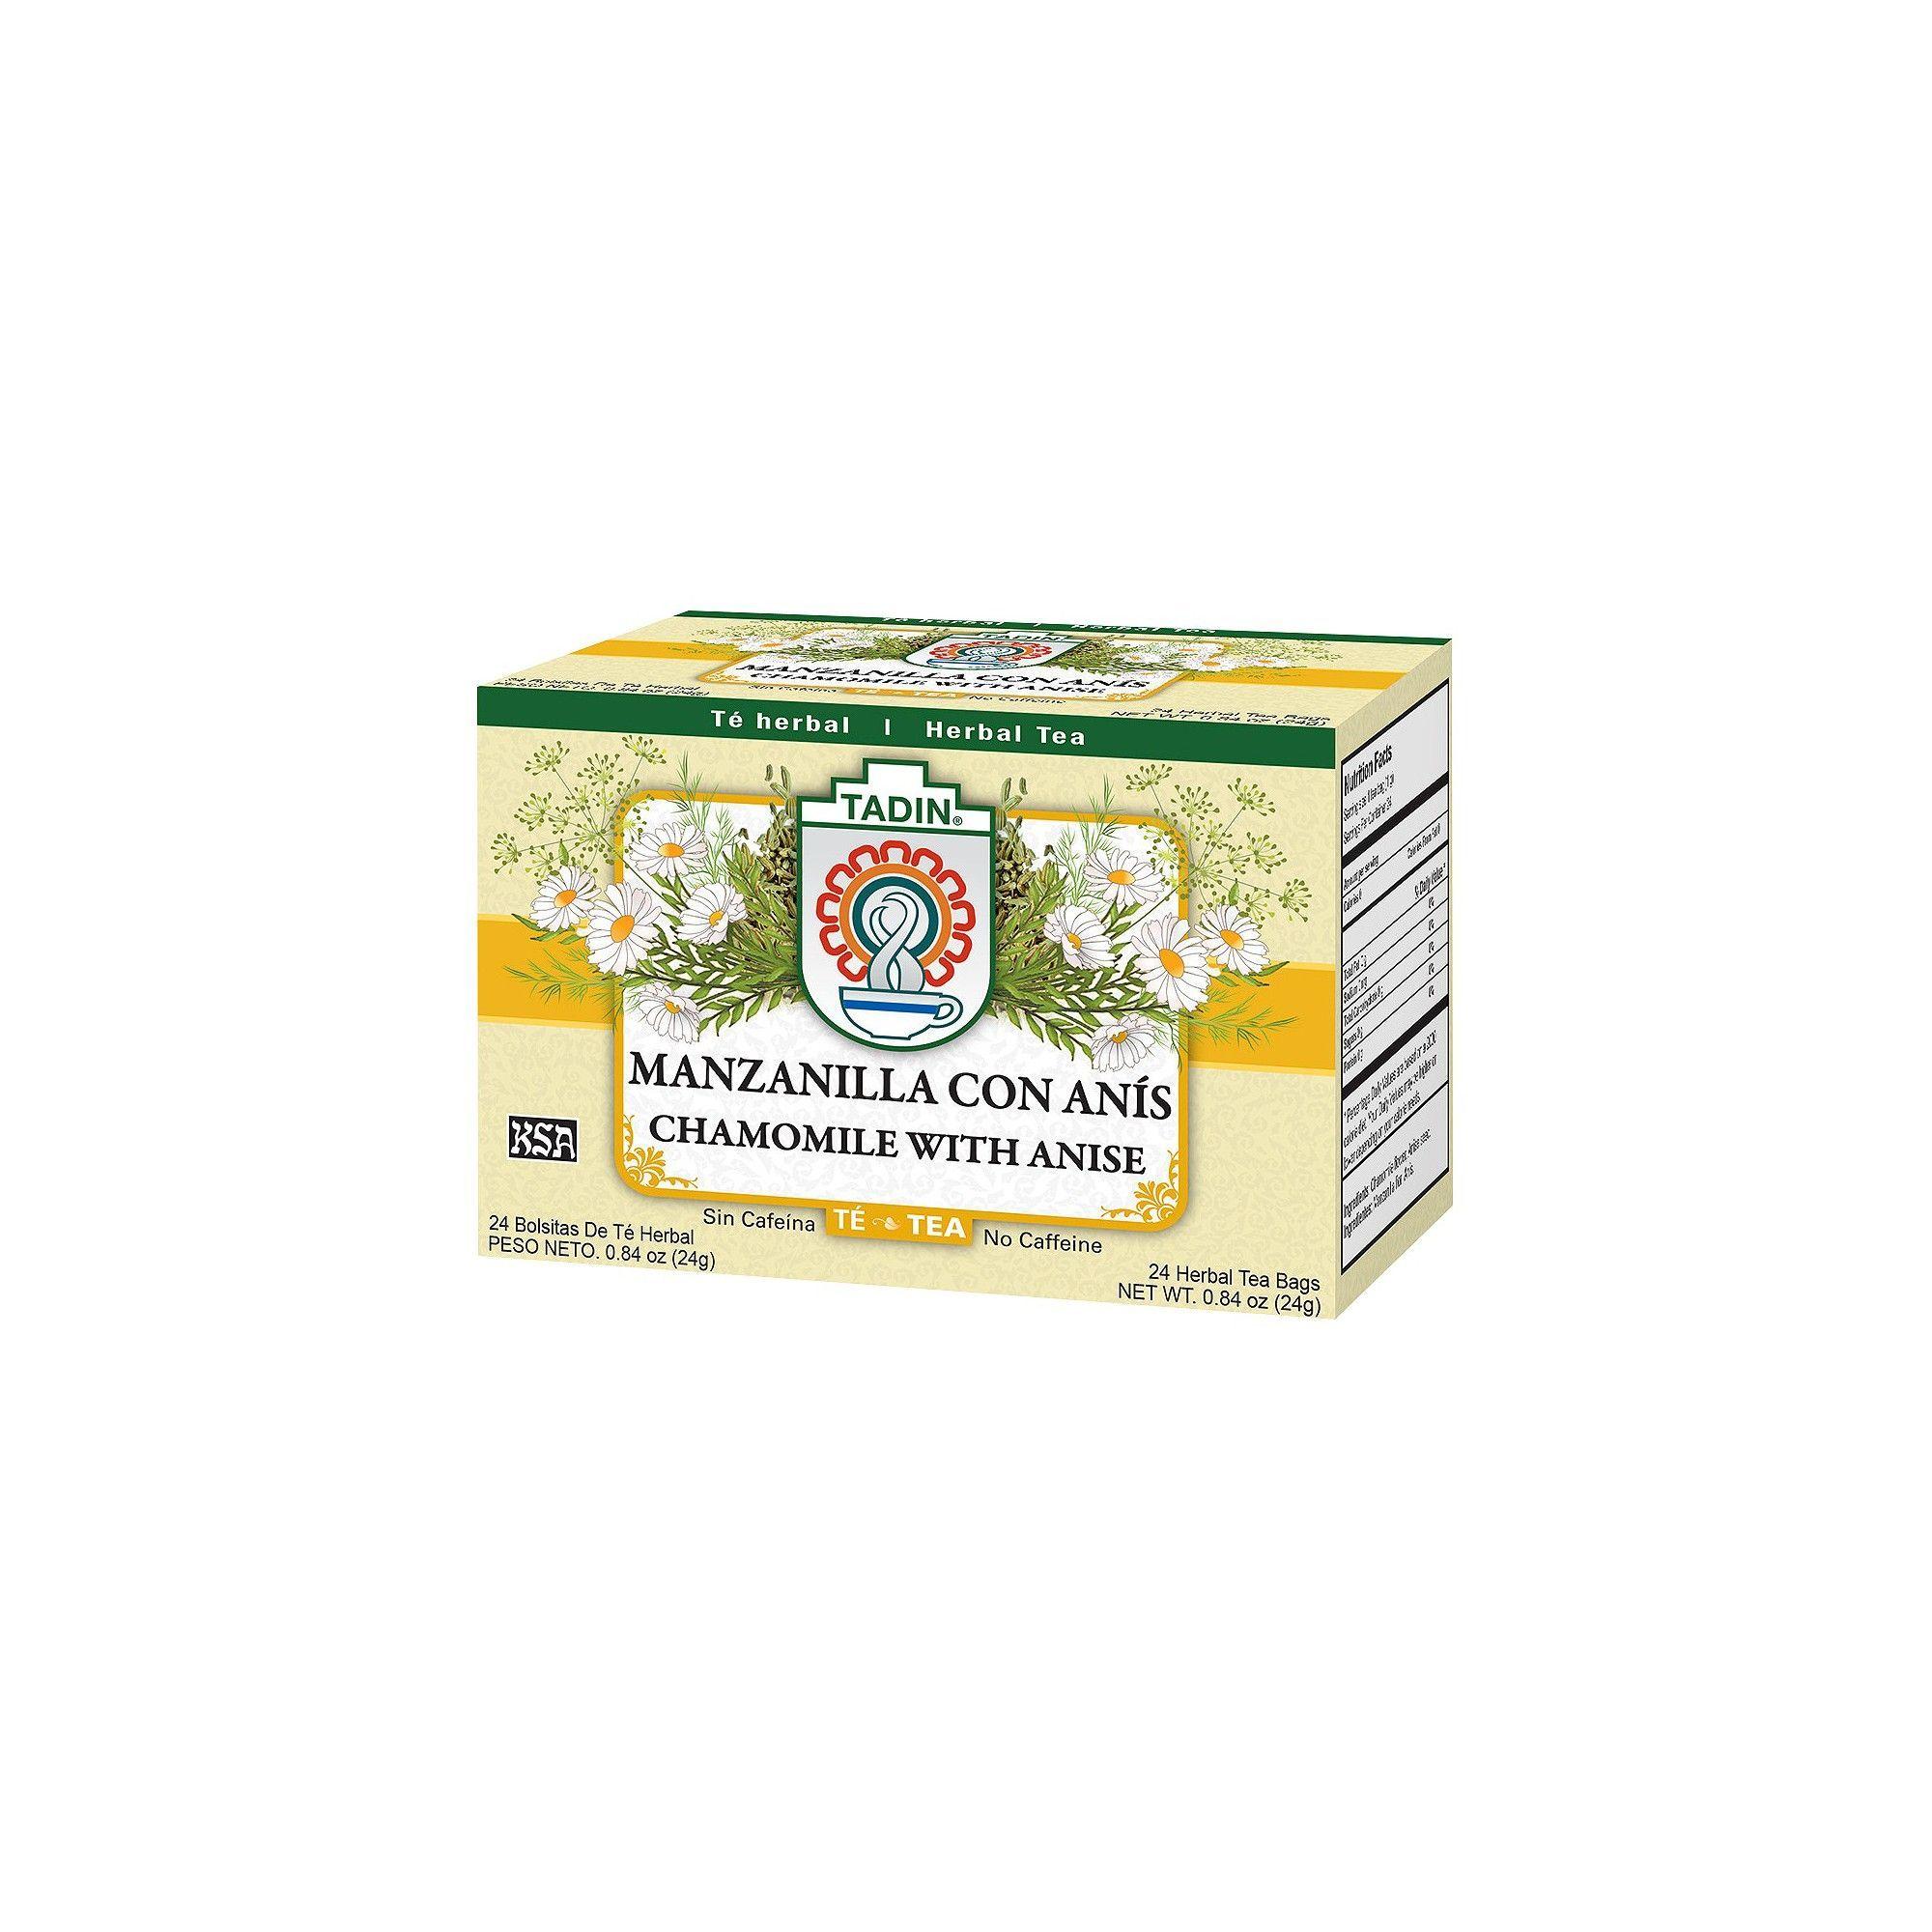 Tadin Manzanilla Con Anis Chamomile With Anise Tea 24ct Tea Chamomile Tea Chamomiles